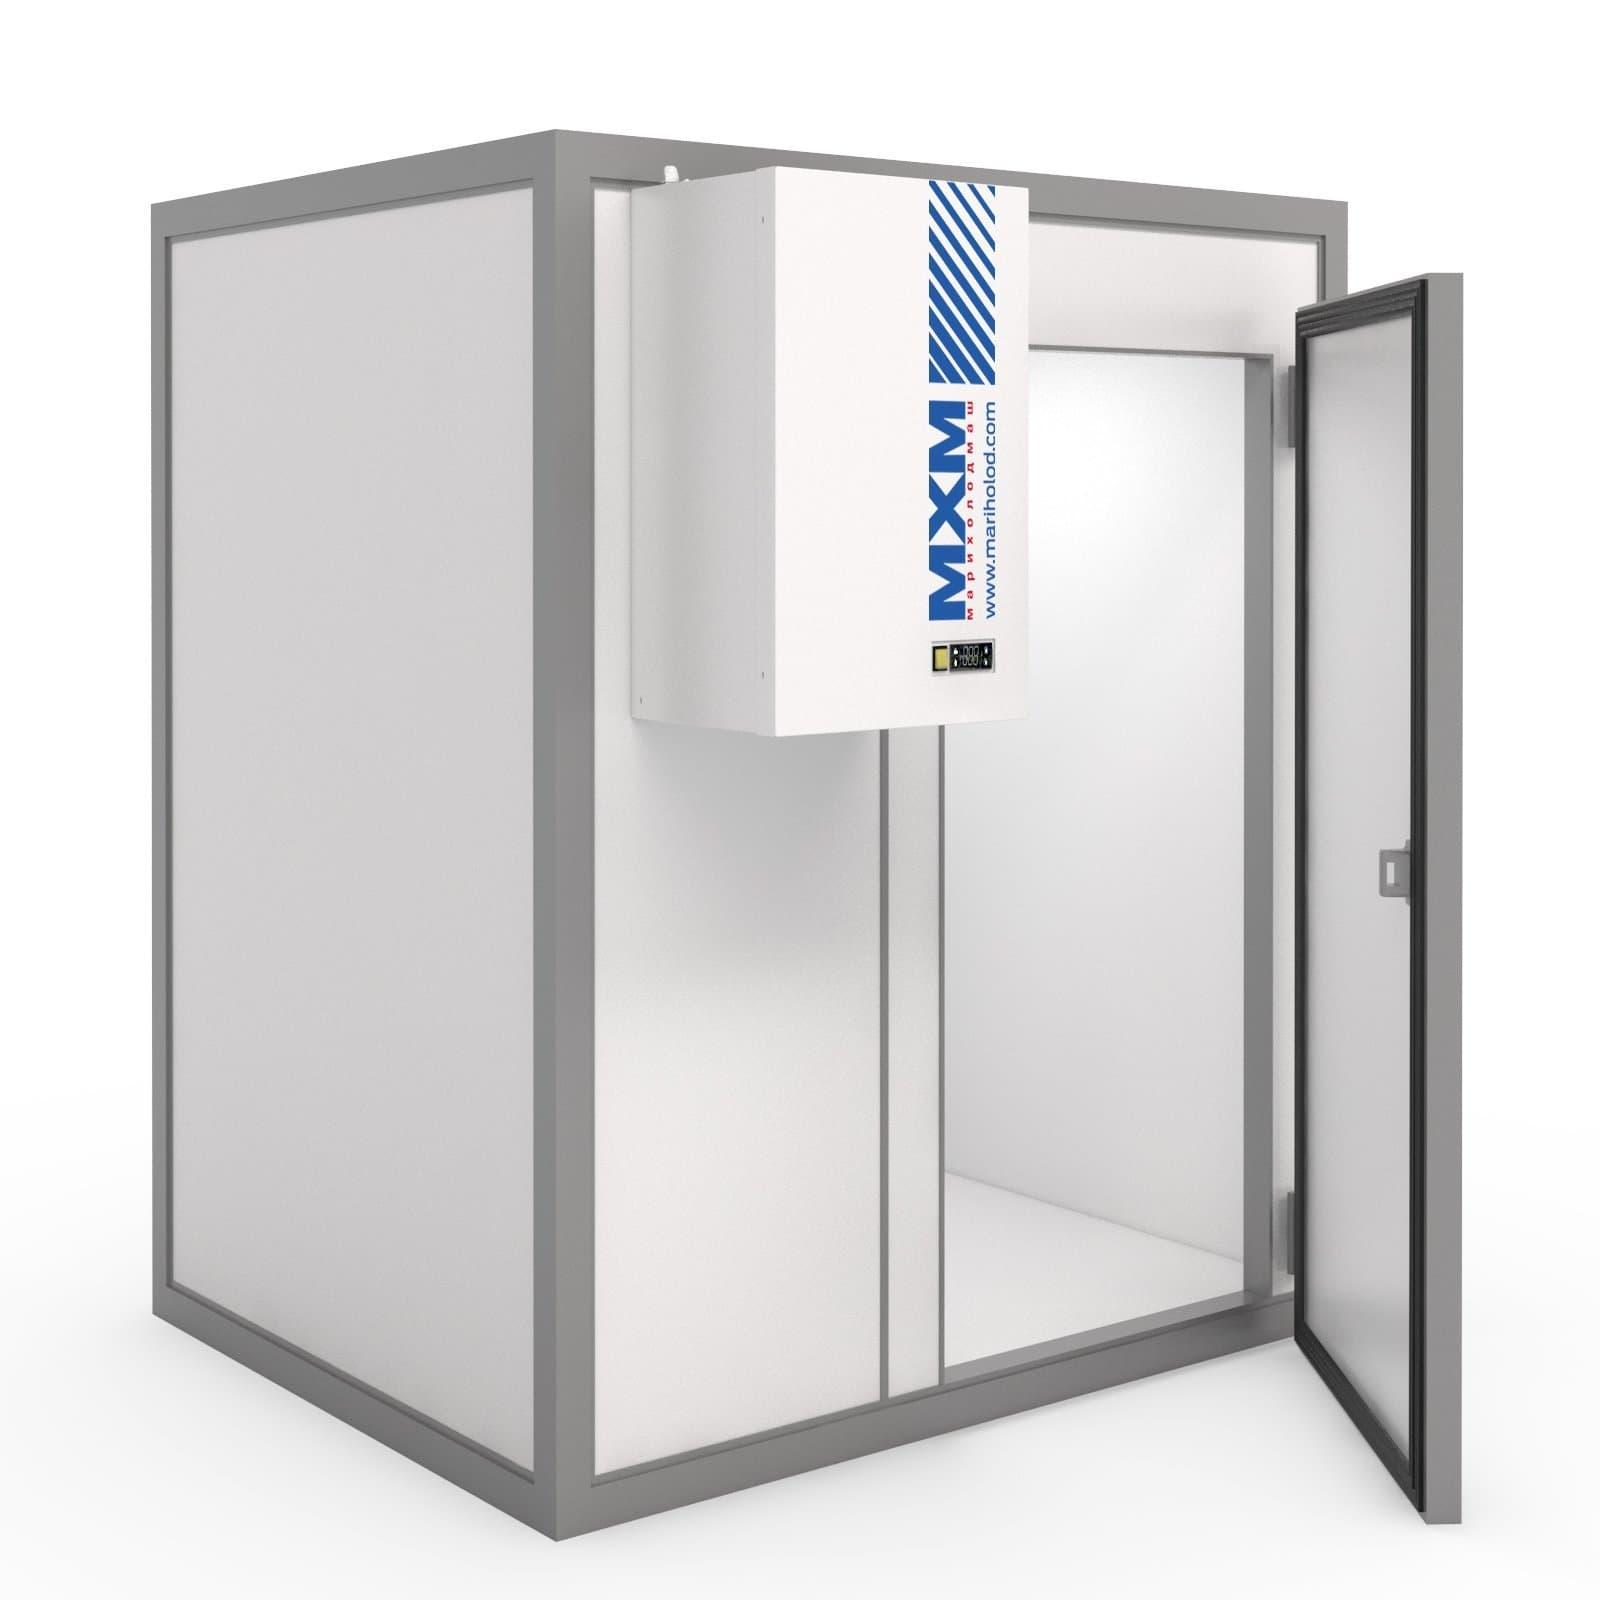 Камера холодильная КХН-42,39 (2560×7060×2720 мм)